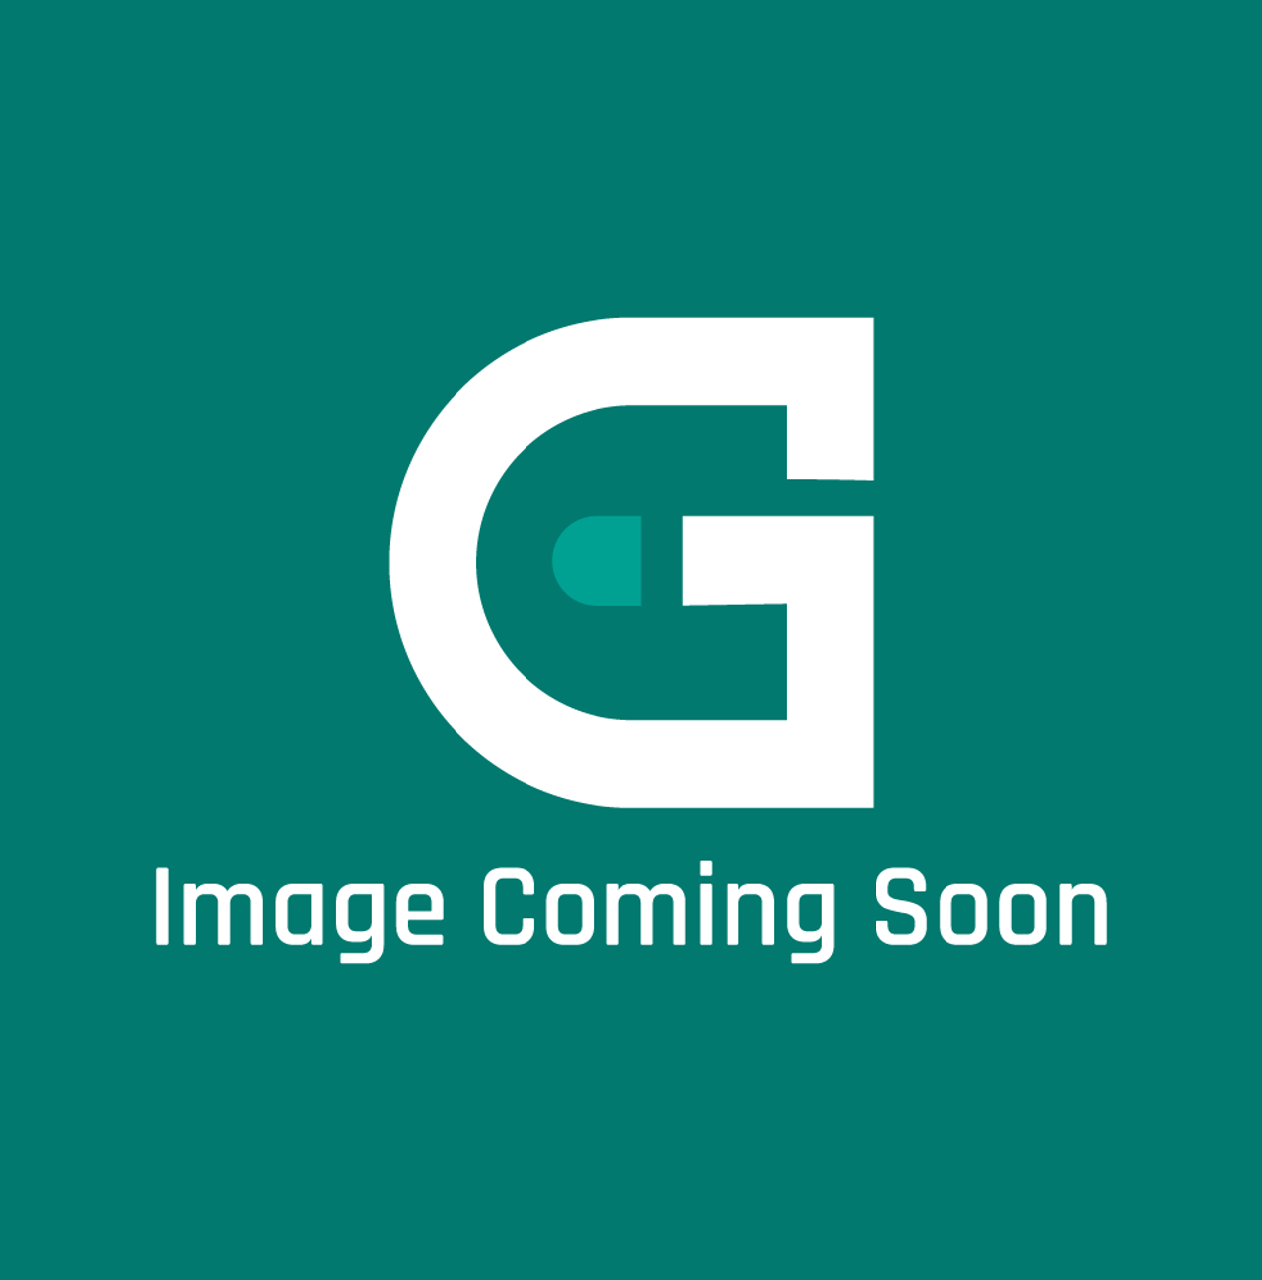 Viking PA020042 - TYTRONICS 0+6 SPARK MODULE - Image Coming Soon!